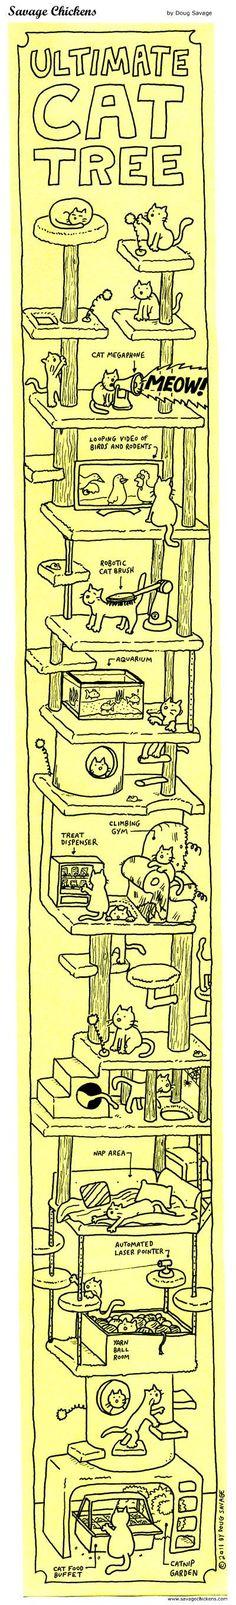 Ultimate Cat Tree Cartoon | Savage Chickens – Cartoons on Sticky Notes by Doug Savage